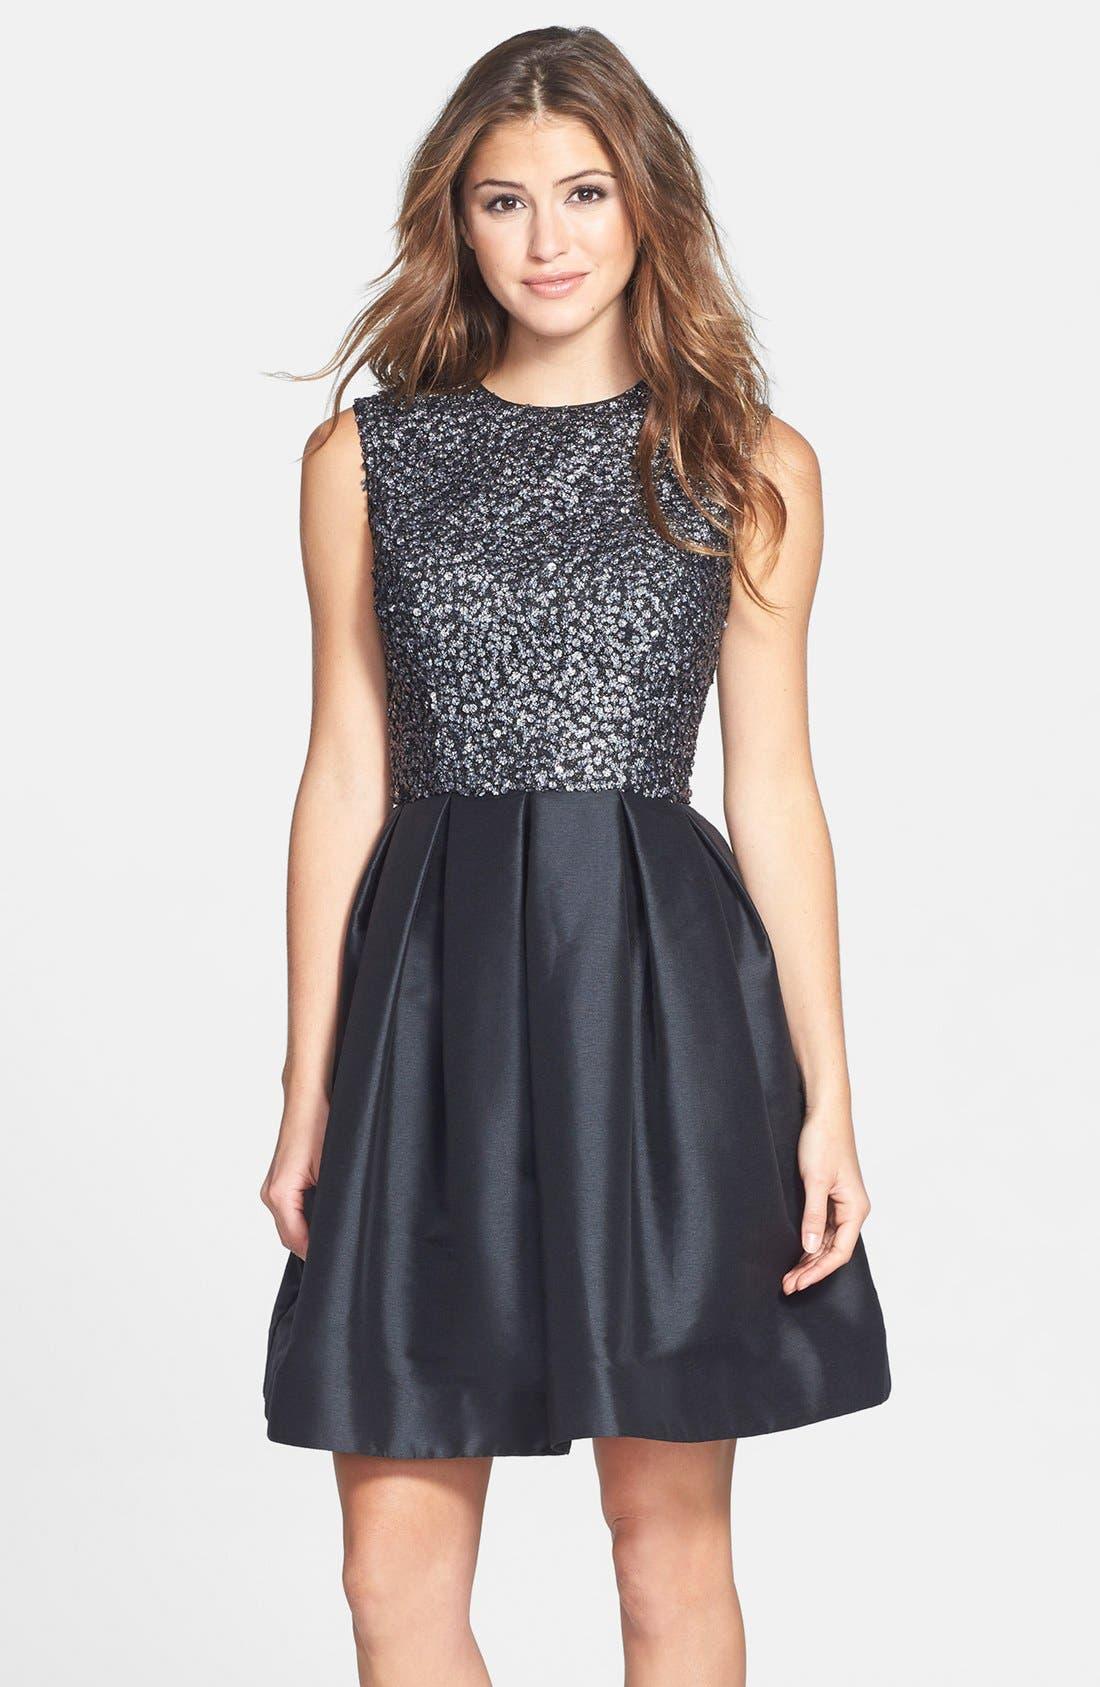 Alternate Image 1 Selected - ML Monique Lhuillier Embellished Fit & Flare Dress